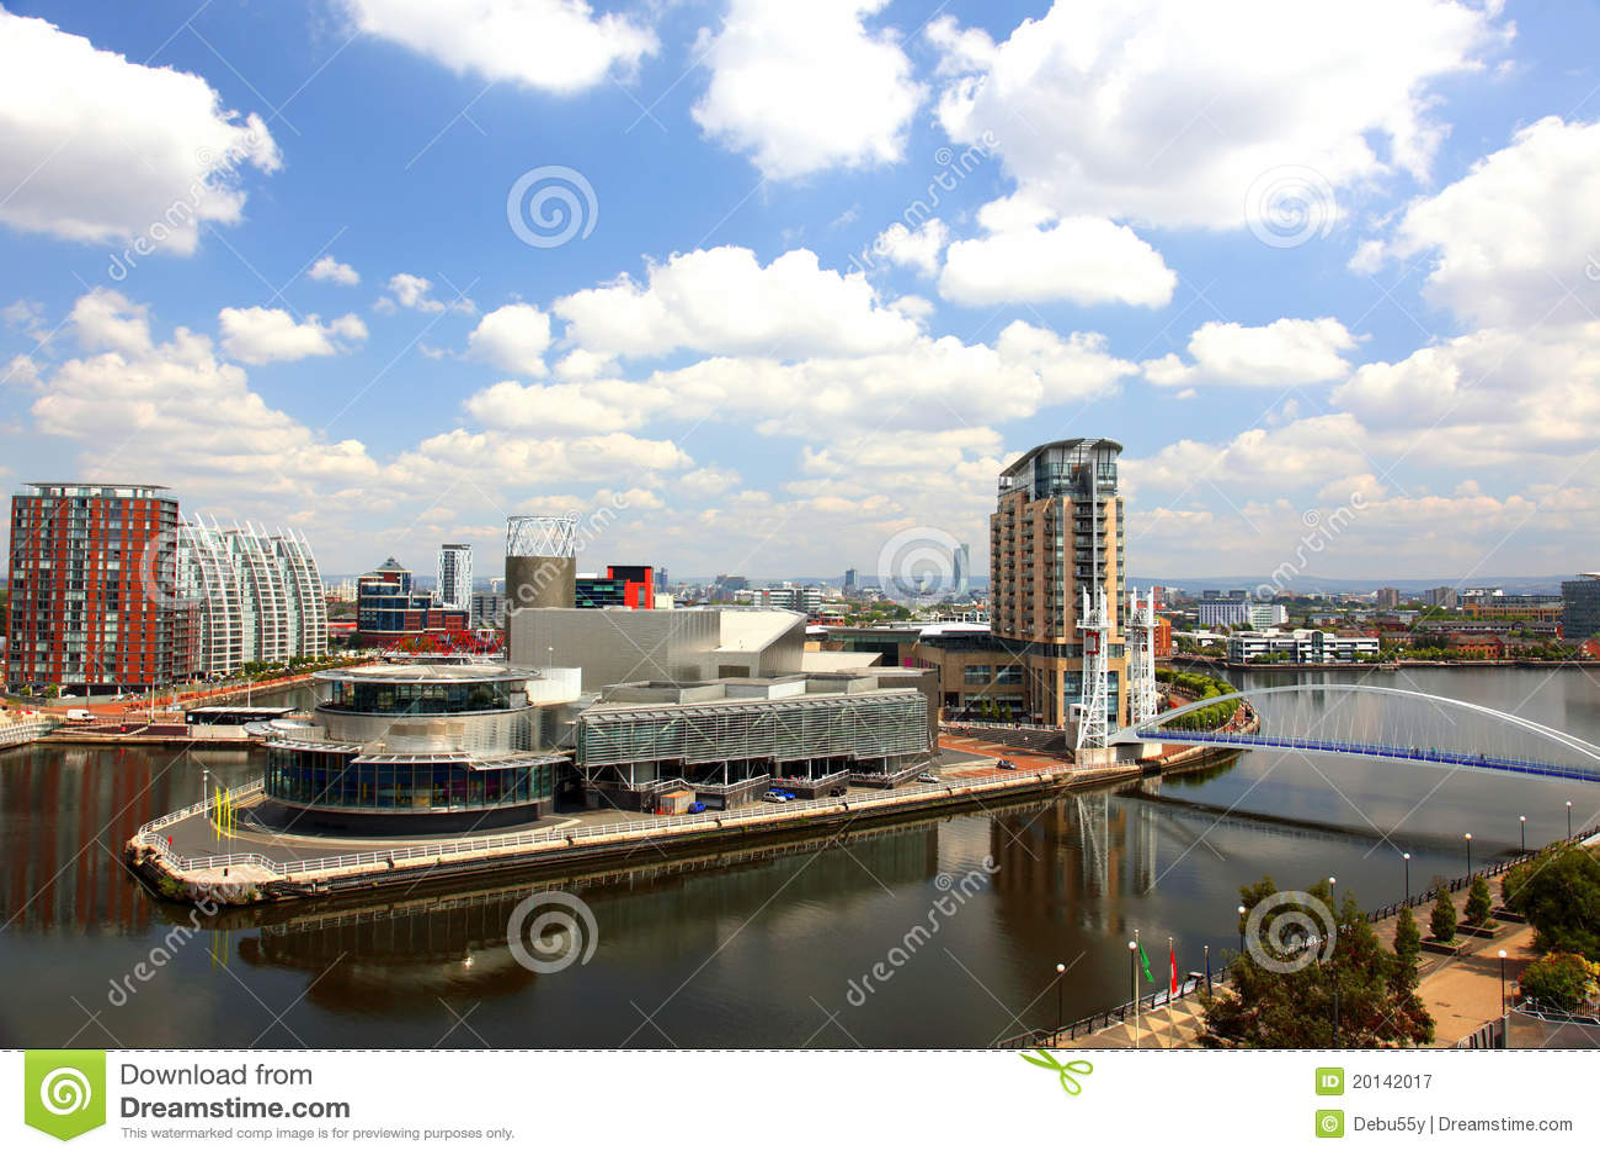 Panoramic view of Manchester, UK